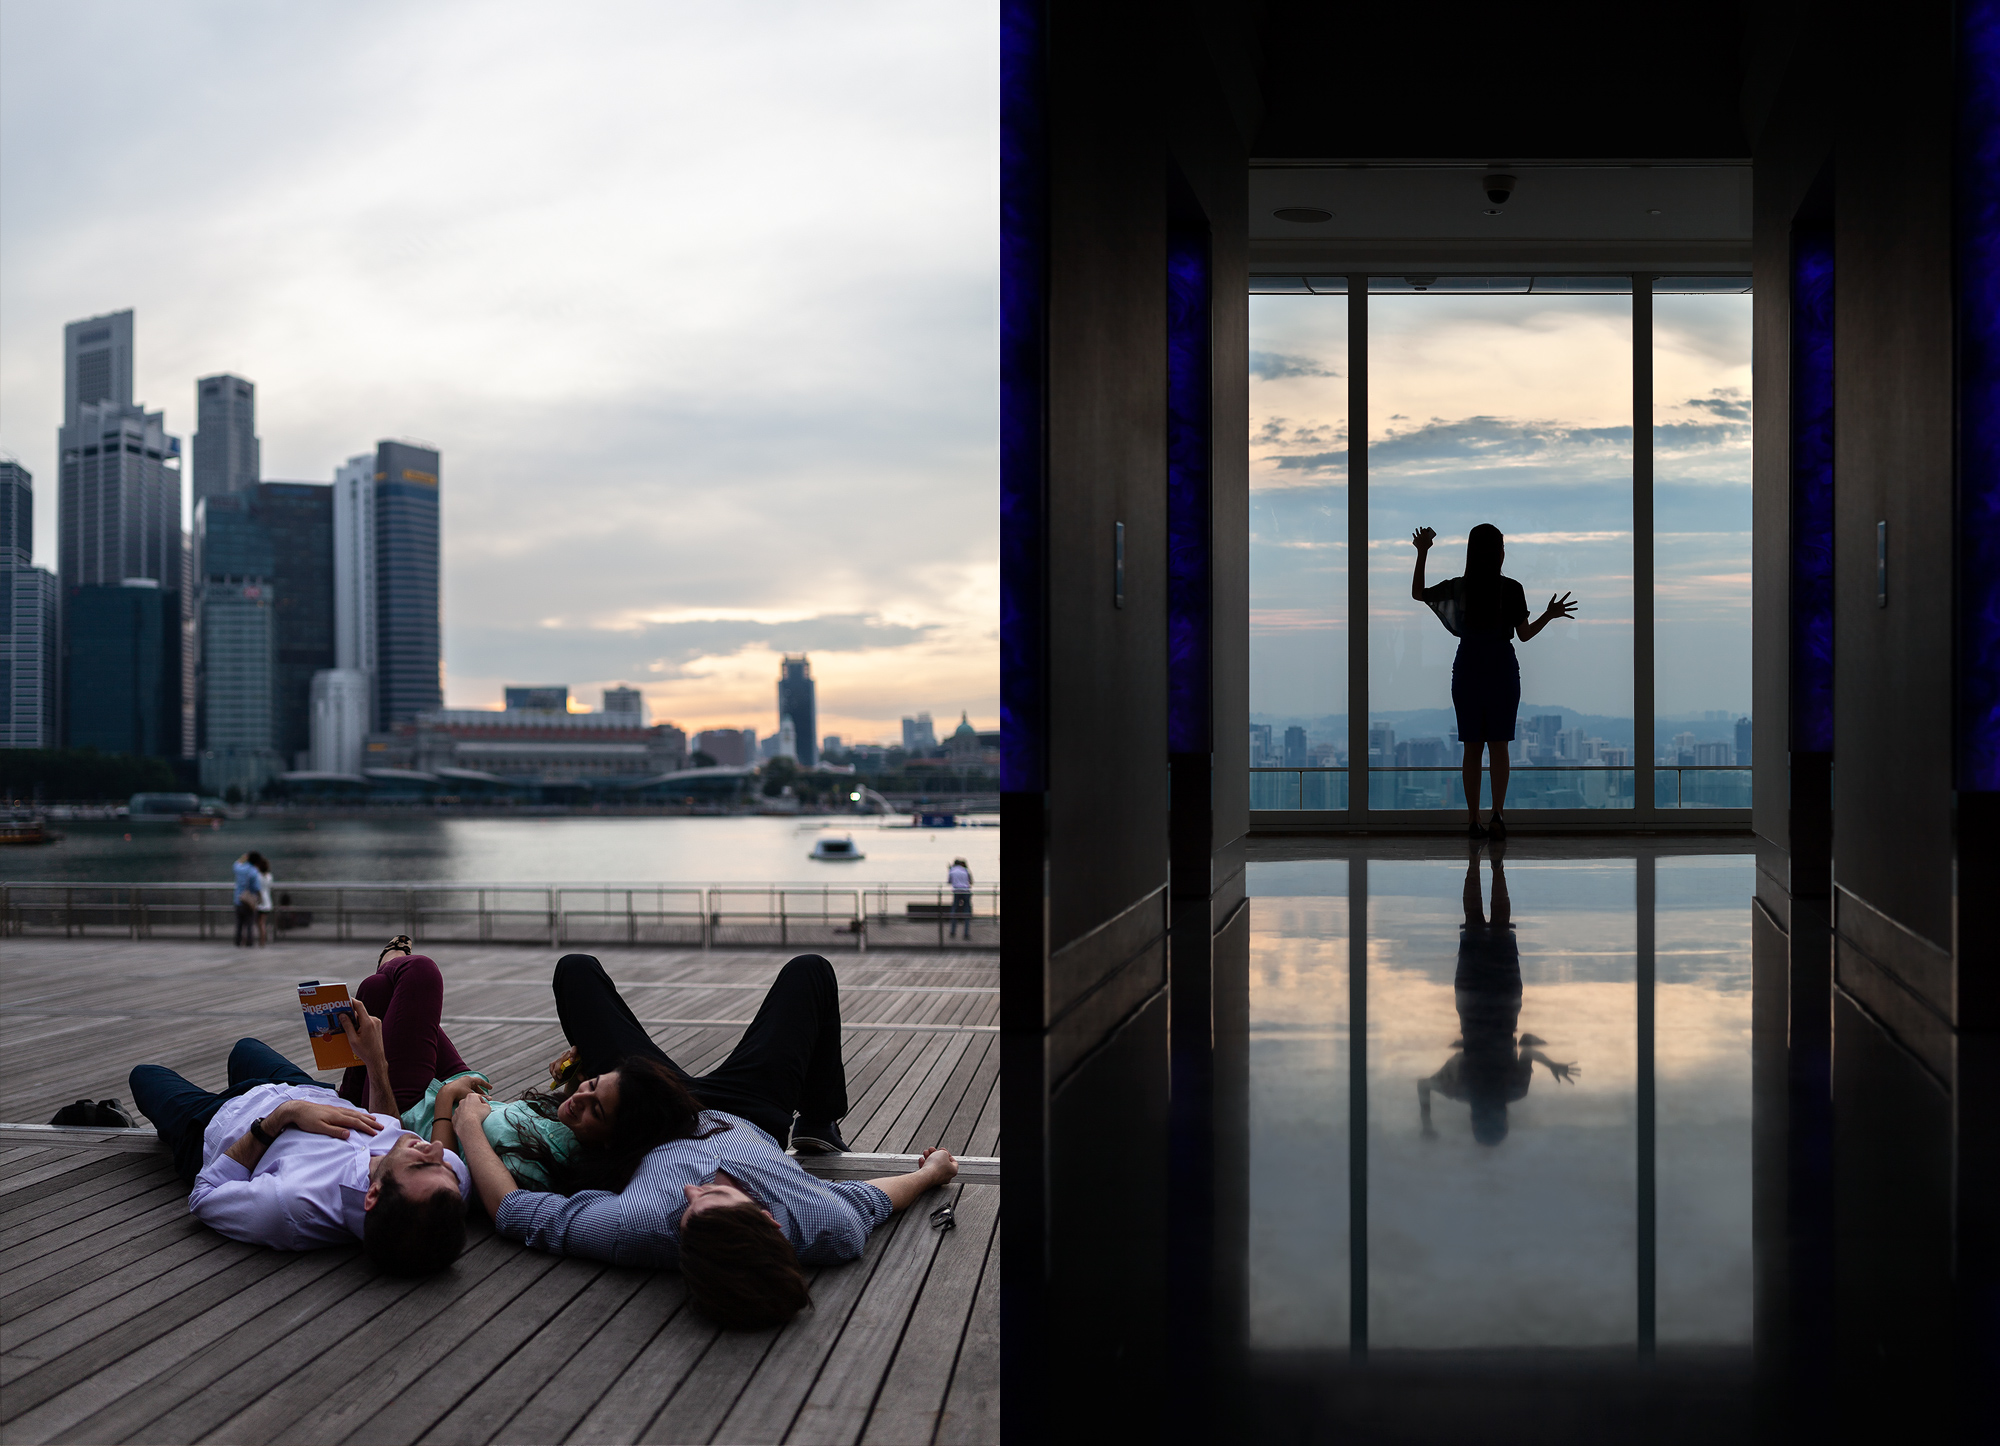 Singapore_©_Sami_Piskonen.jpg